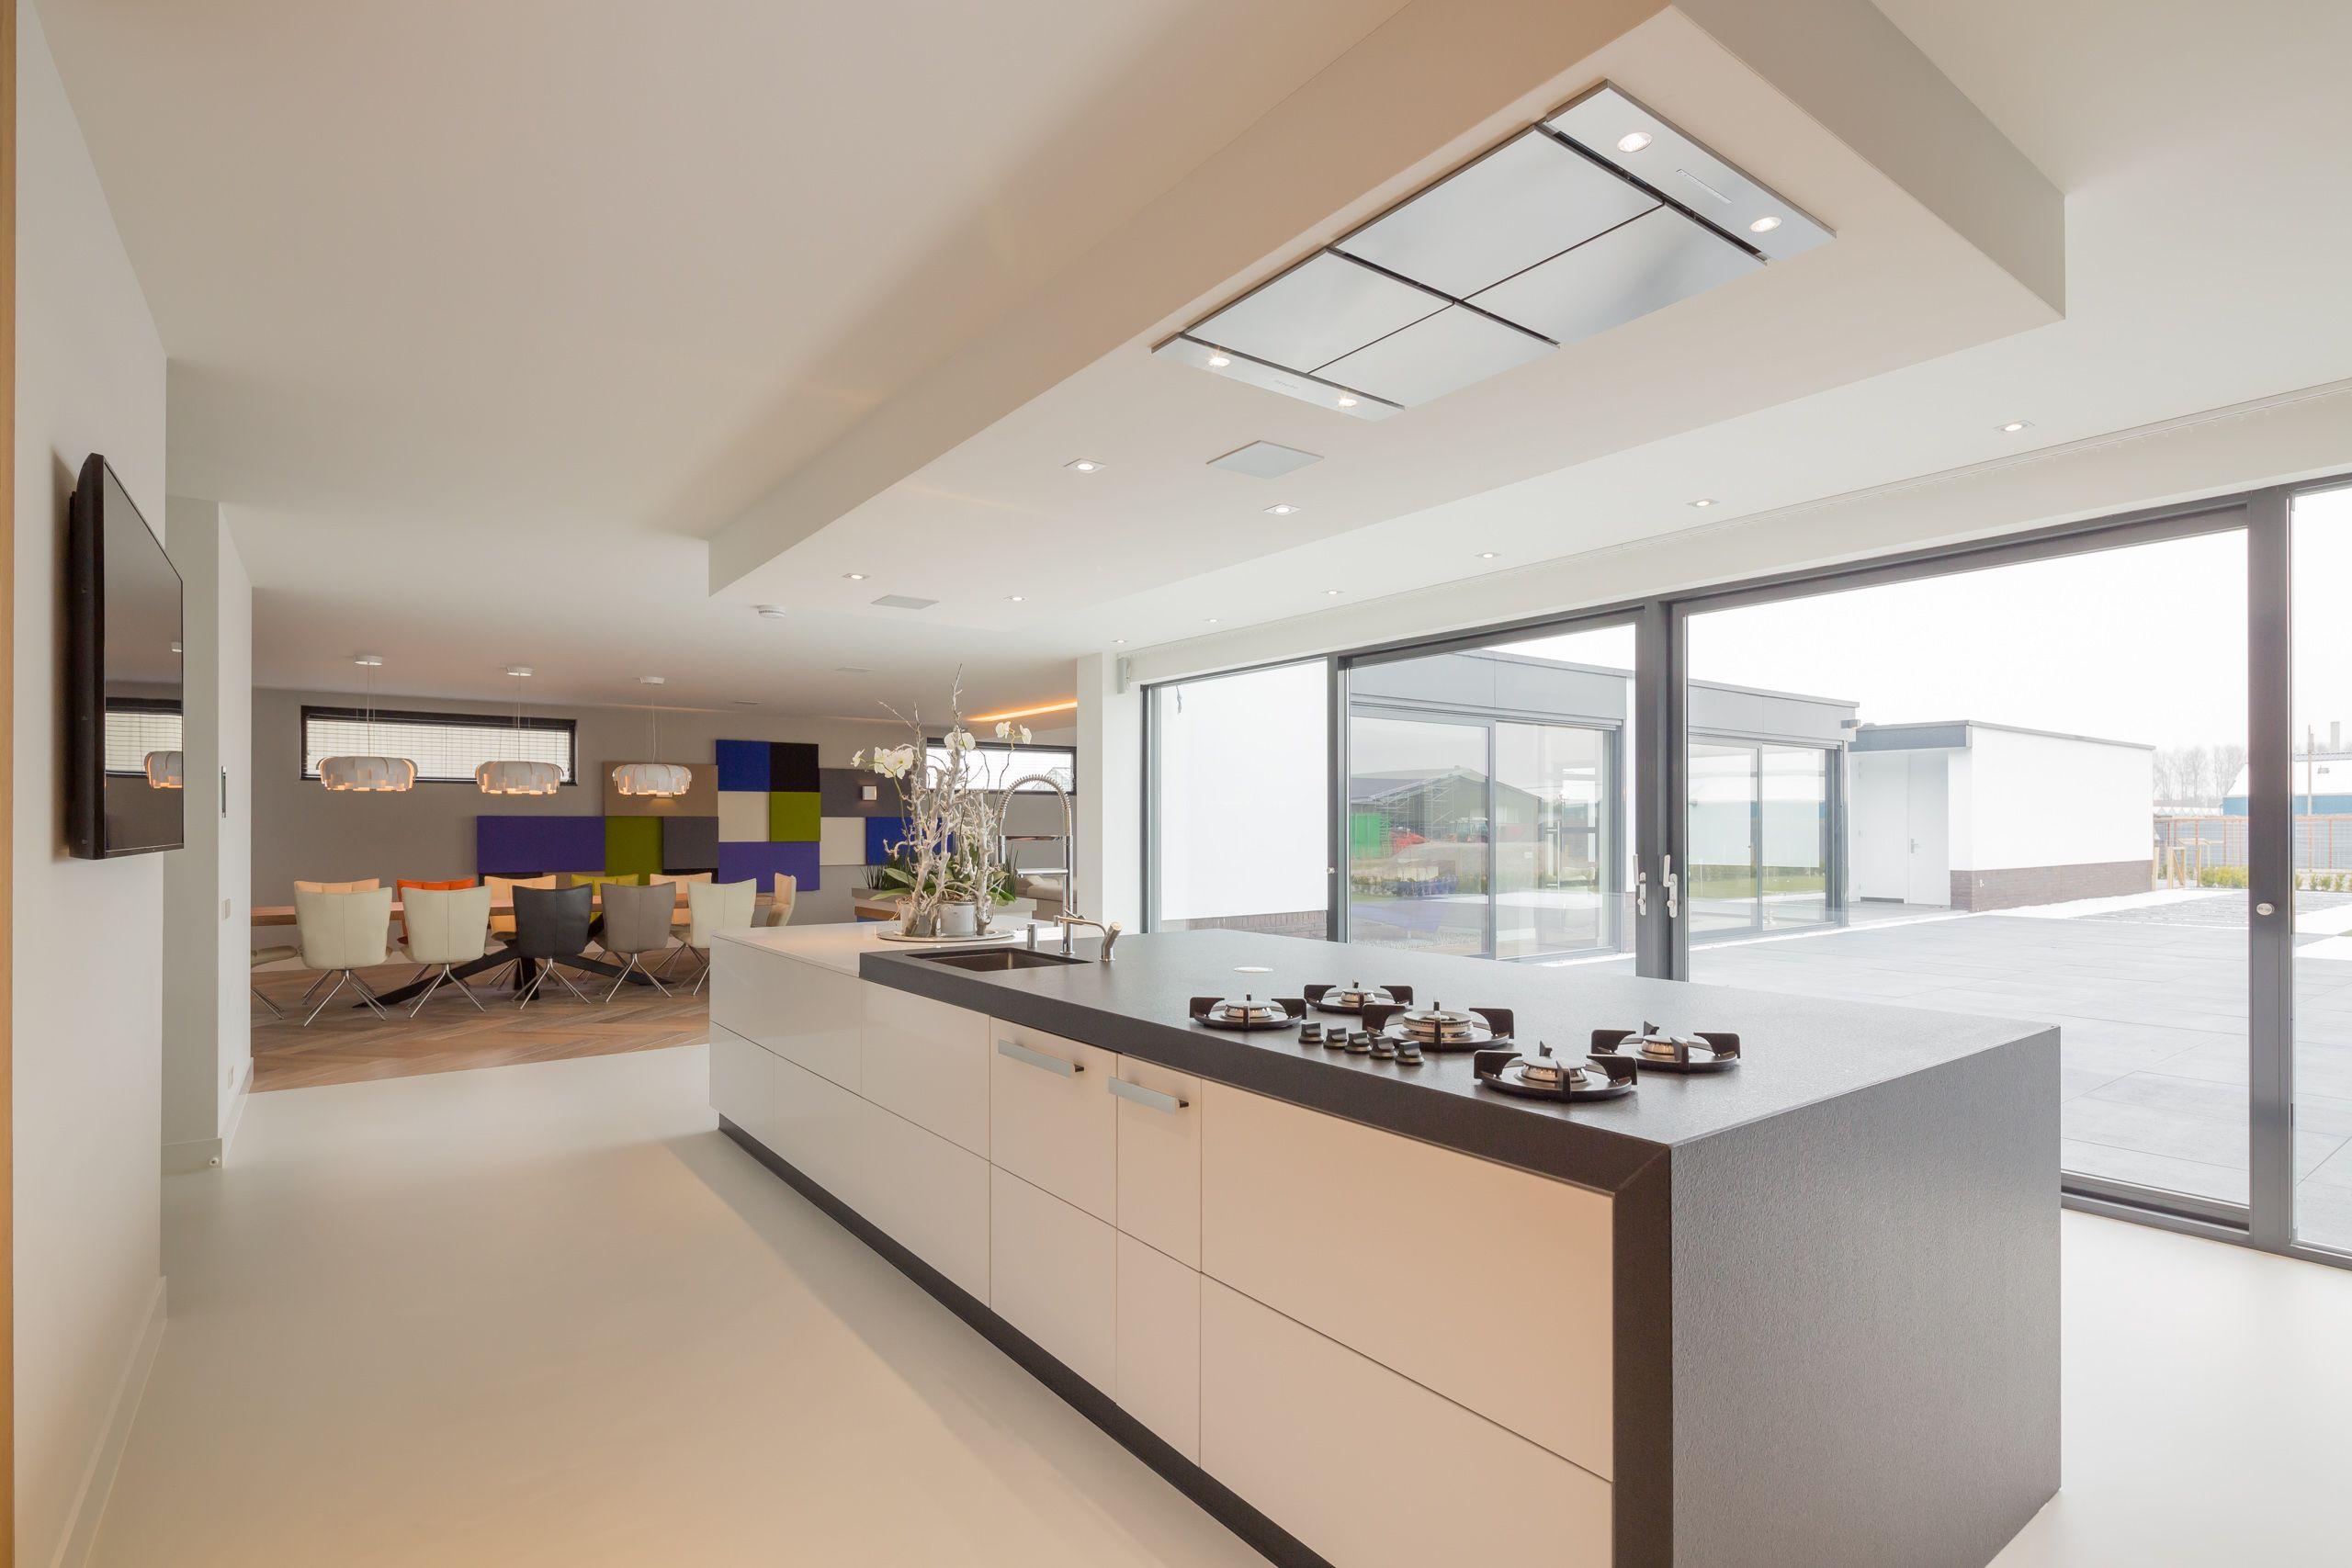 Keukeneiland T Opstelling : Pitt cooking elbrus pitt burners kitchen kitchen